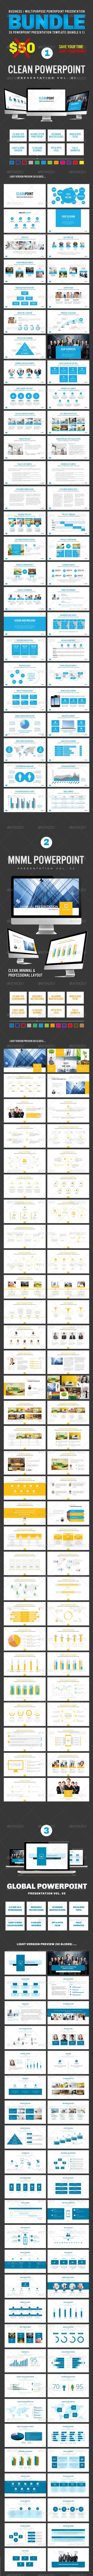 Powerpoint Presentation Bundle (V.01) (Powerpoint Templates) #Powerpoint #Powerpoint_Template #Presentation